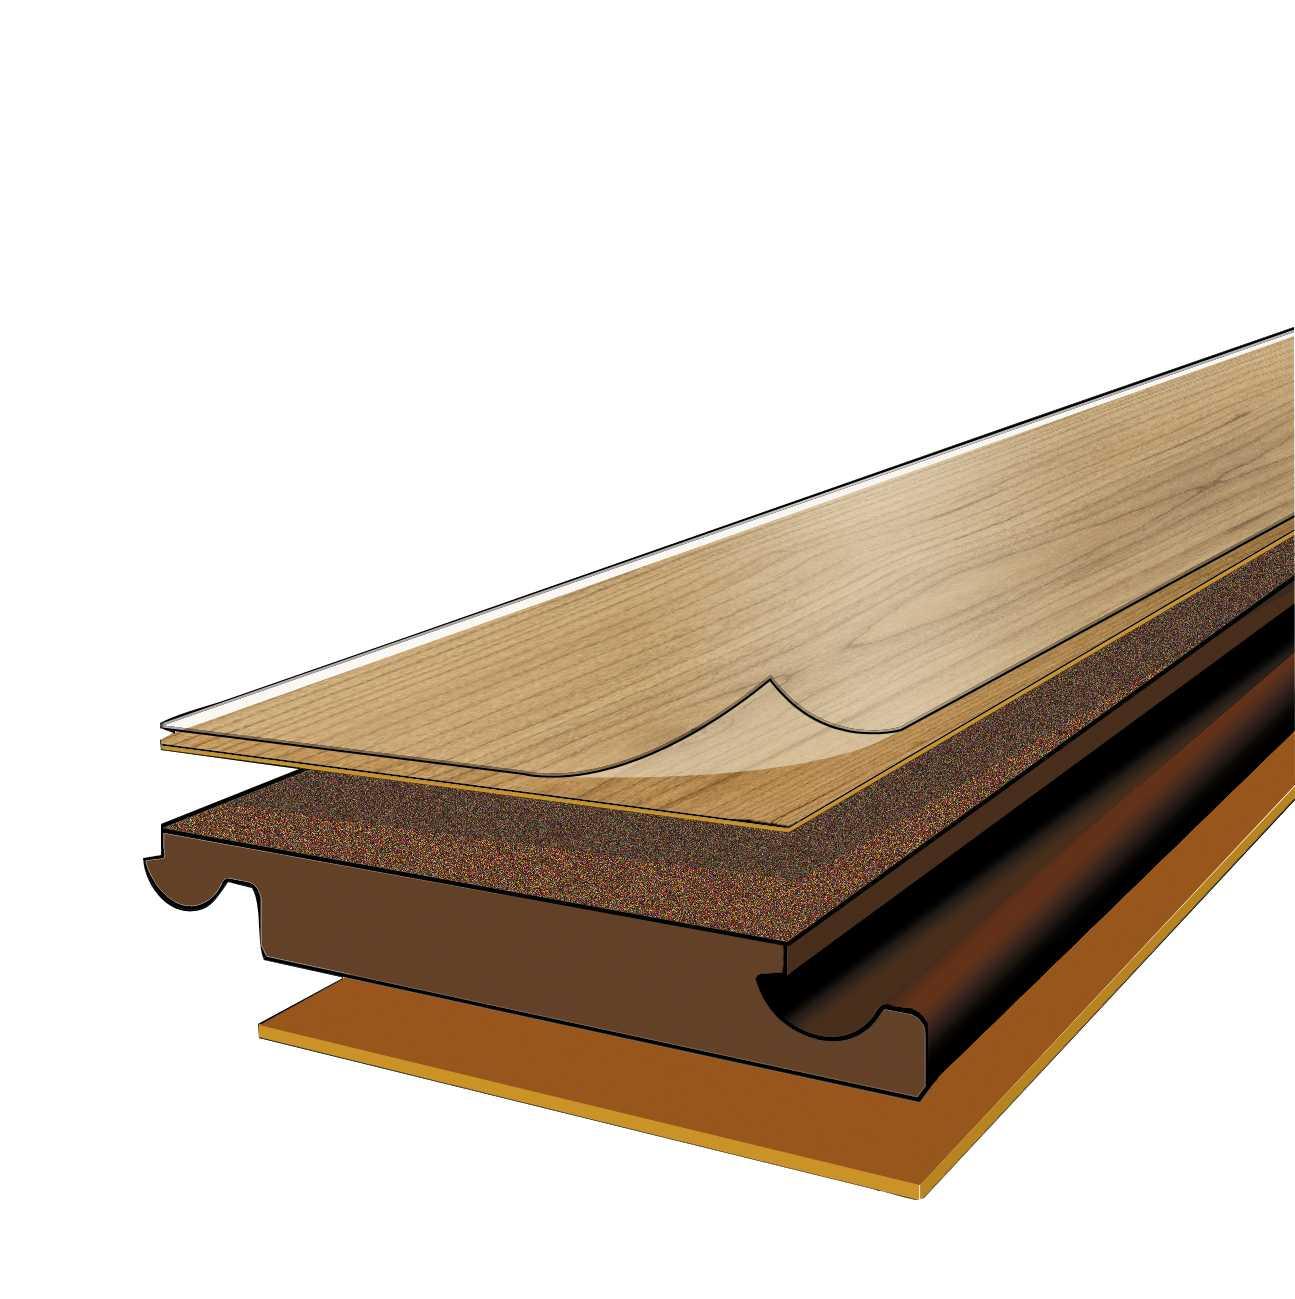 Kronotex Laminate Flooring kronotex villa harbour oak m1203 laminate flooring Kronotex Laminate Flooring Buy Laminate Flooring Product On Alibabacom